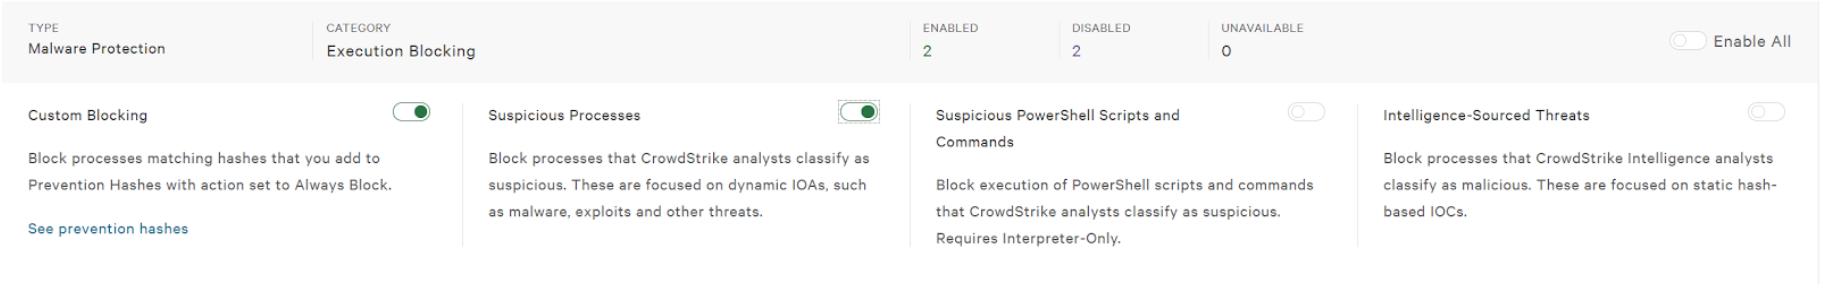 Malware Protection - Custom Blocking